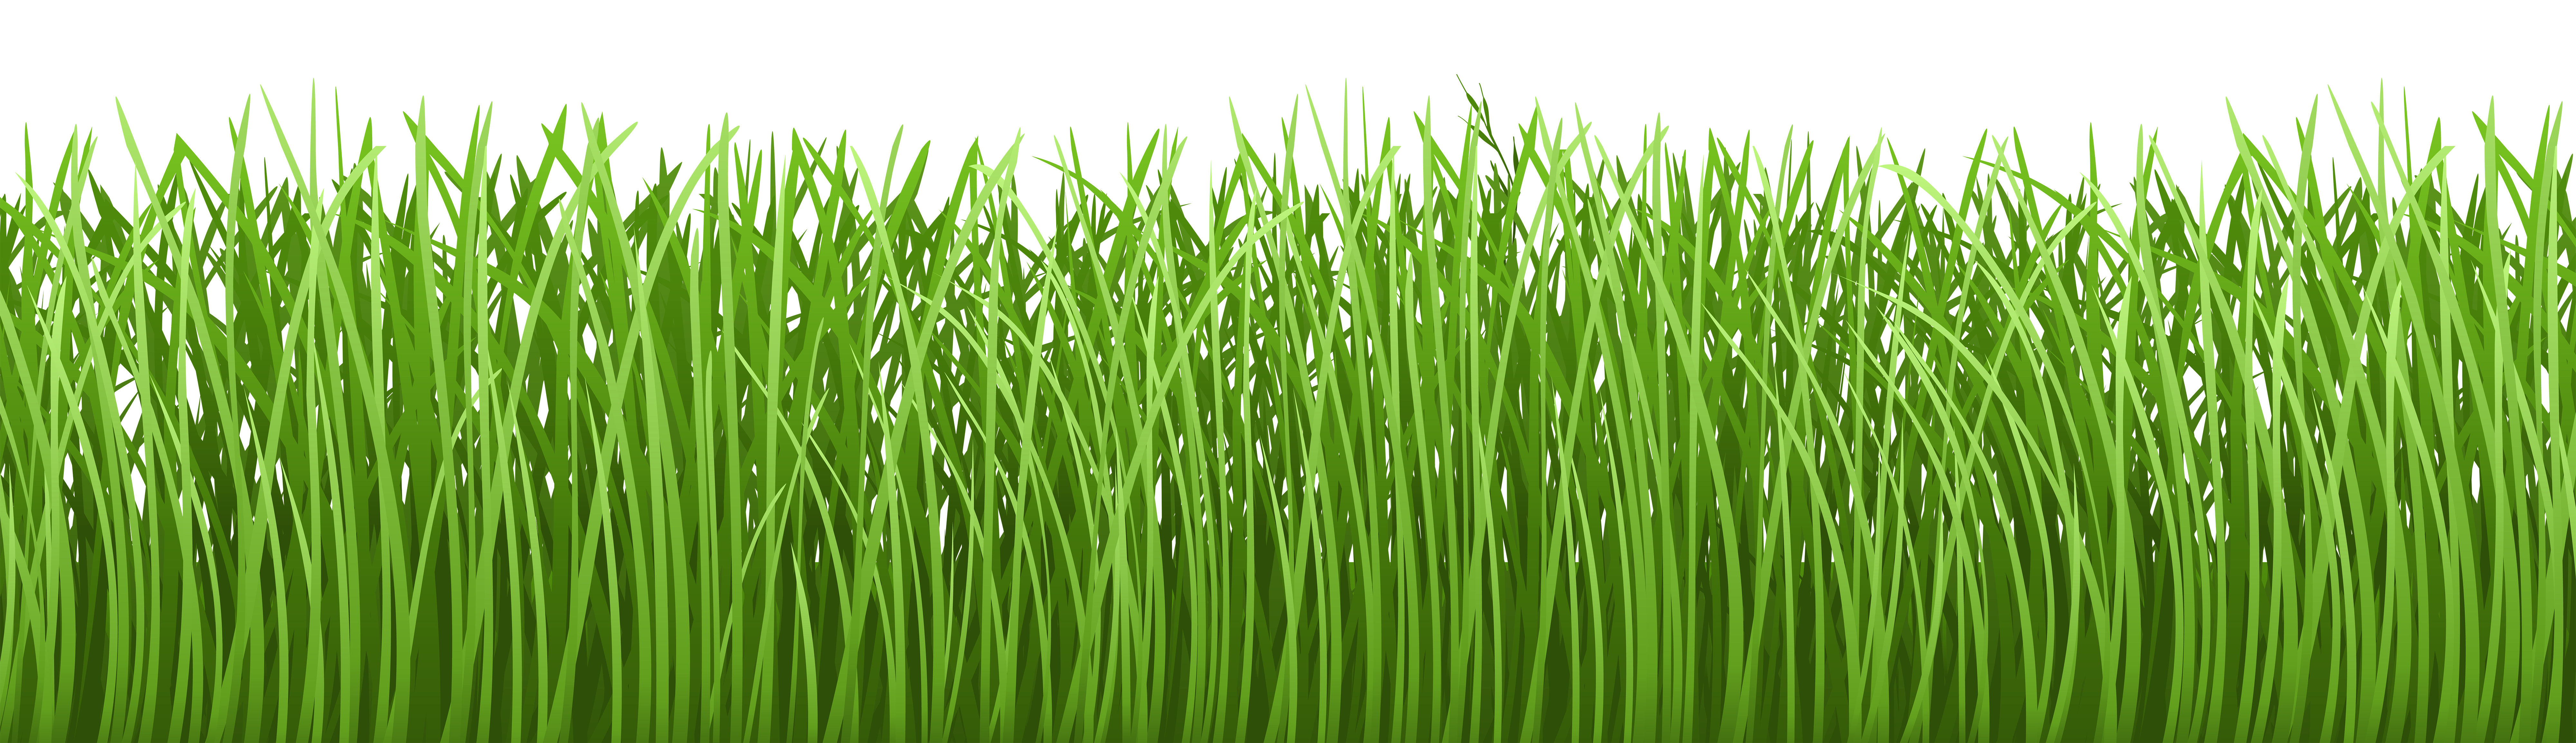 Grass Ground Cover Transparent PNG Clip Art Image.